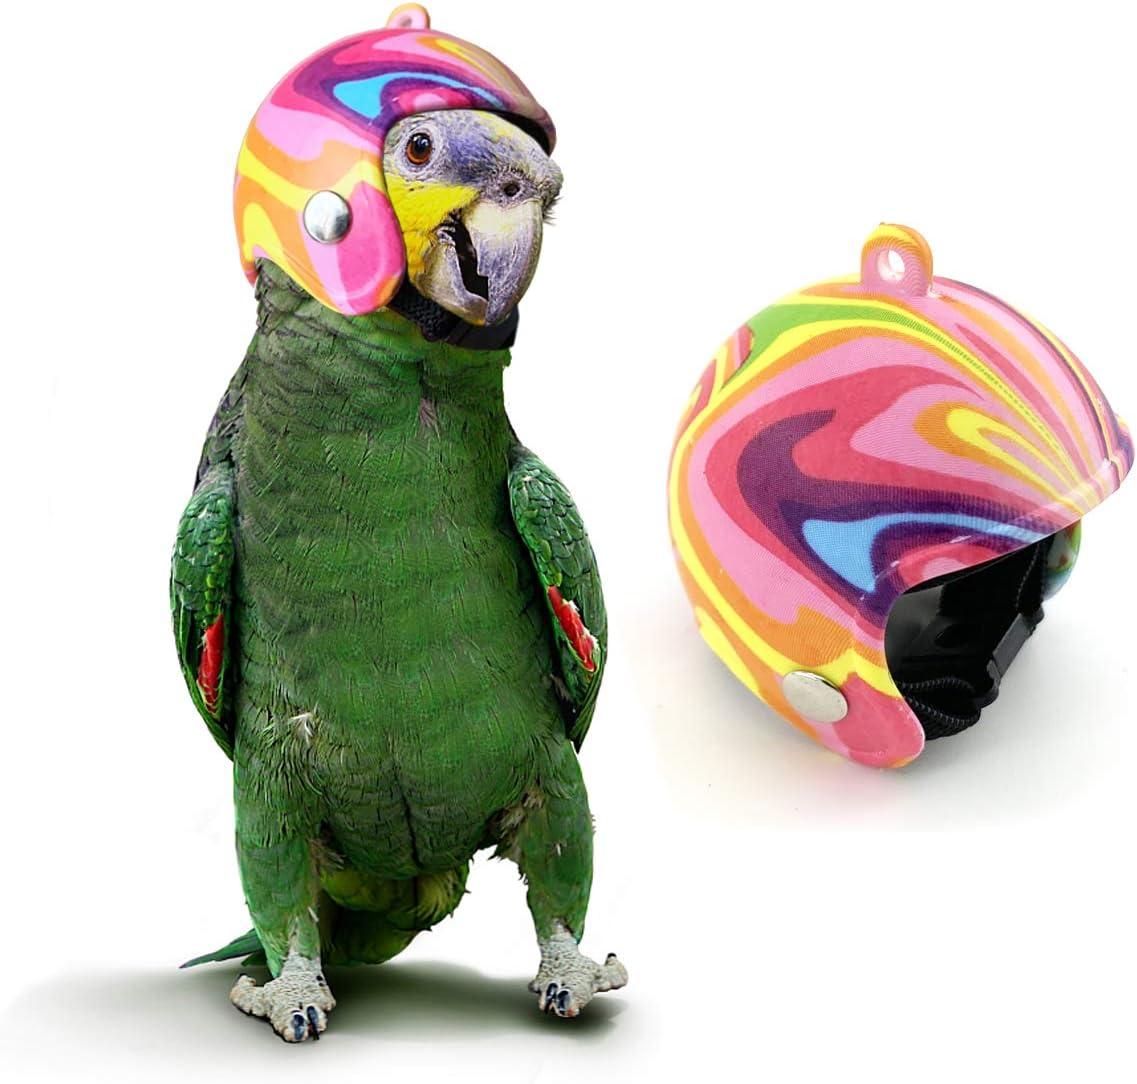 Parrot Toy Space duck Bird